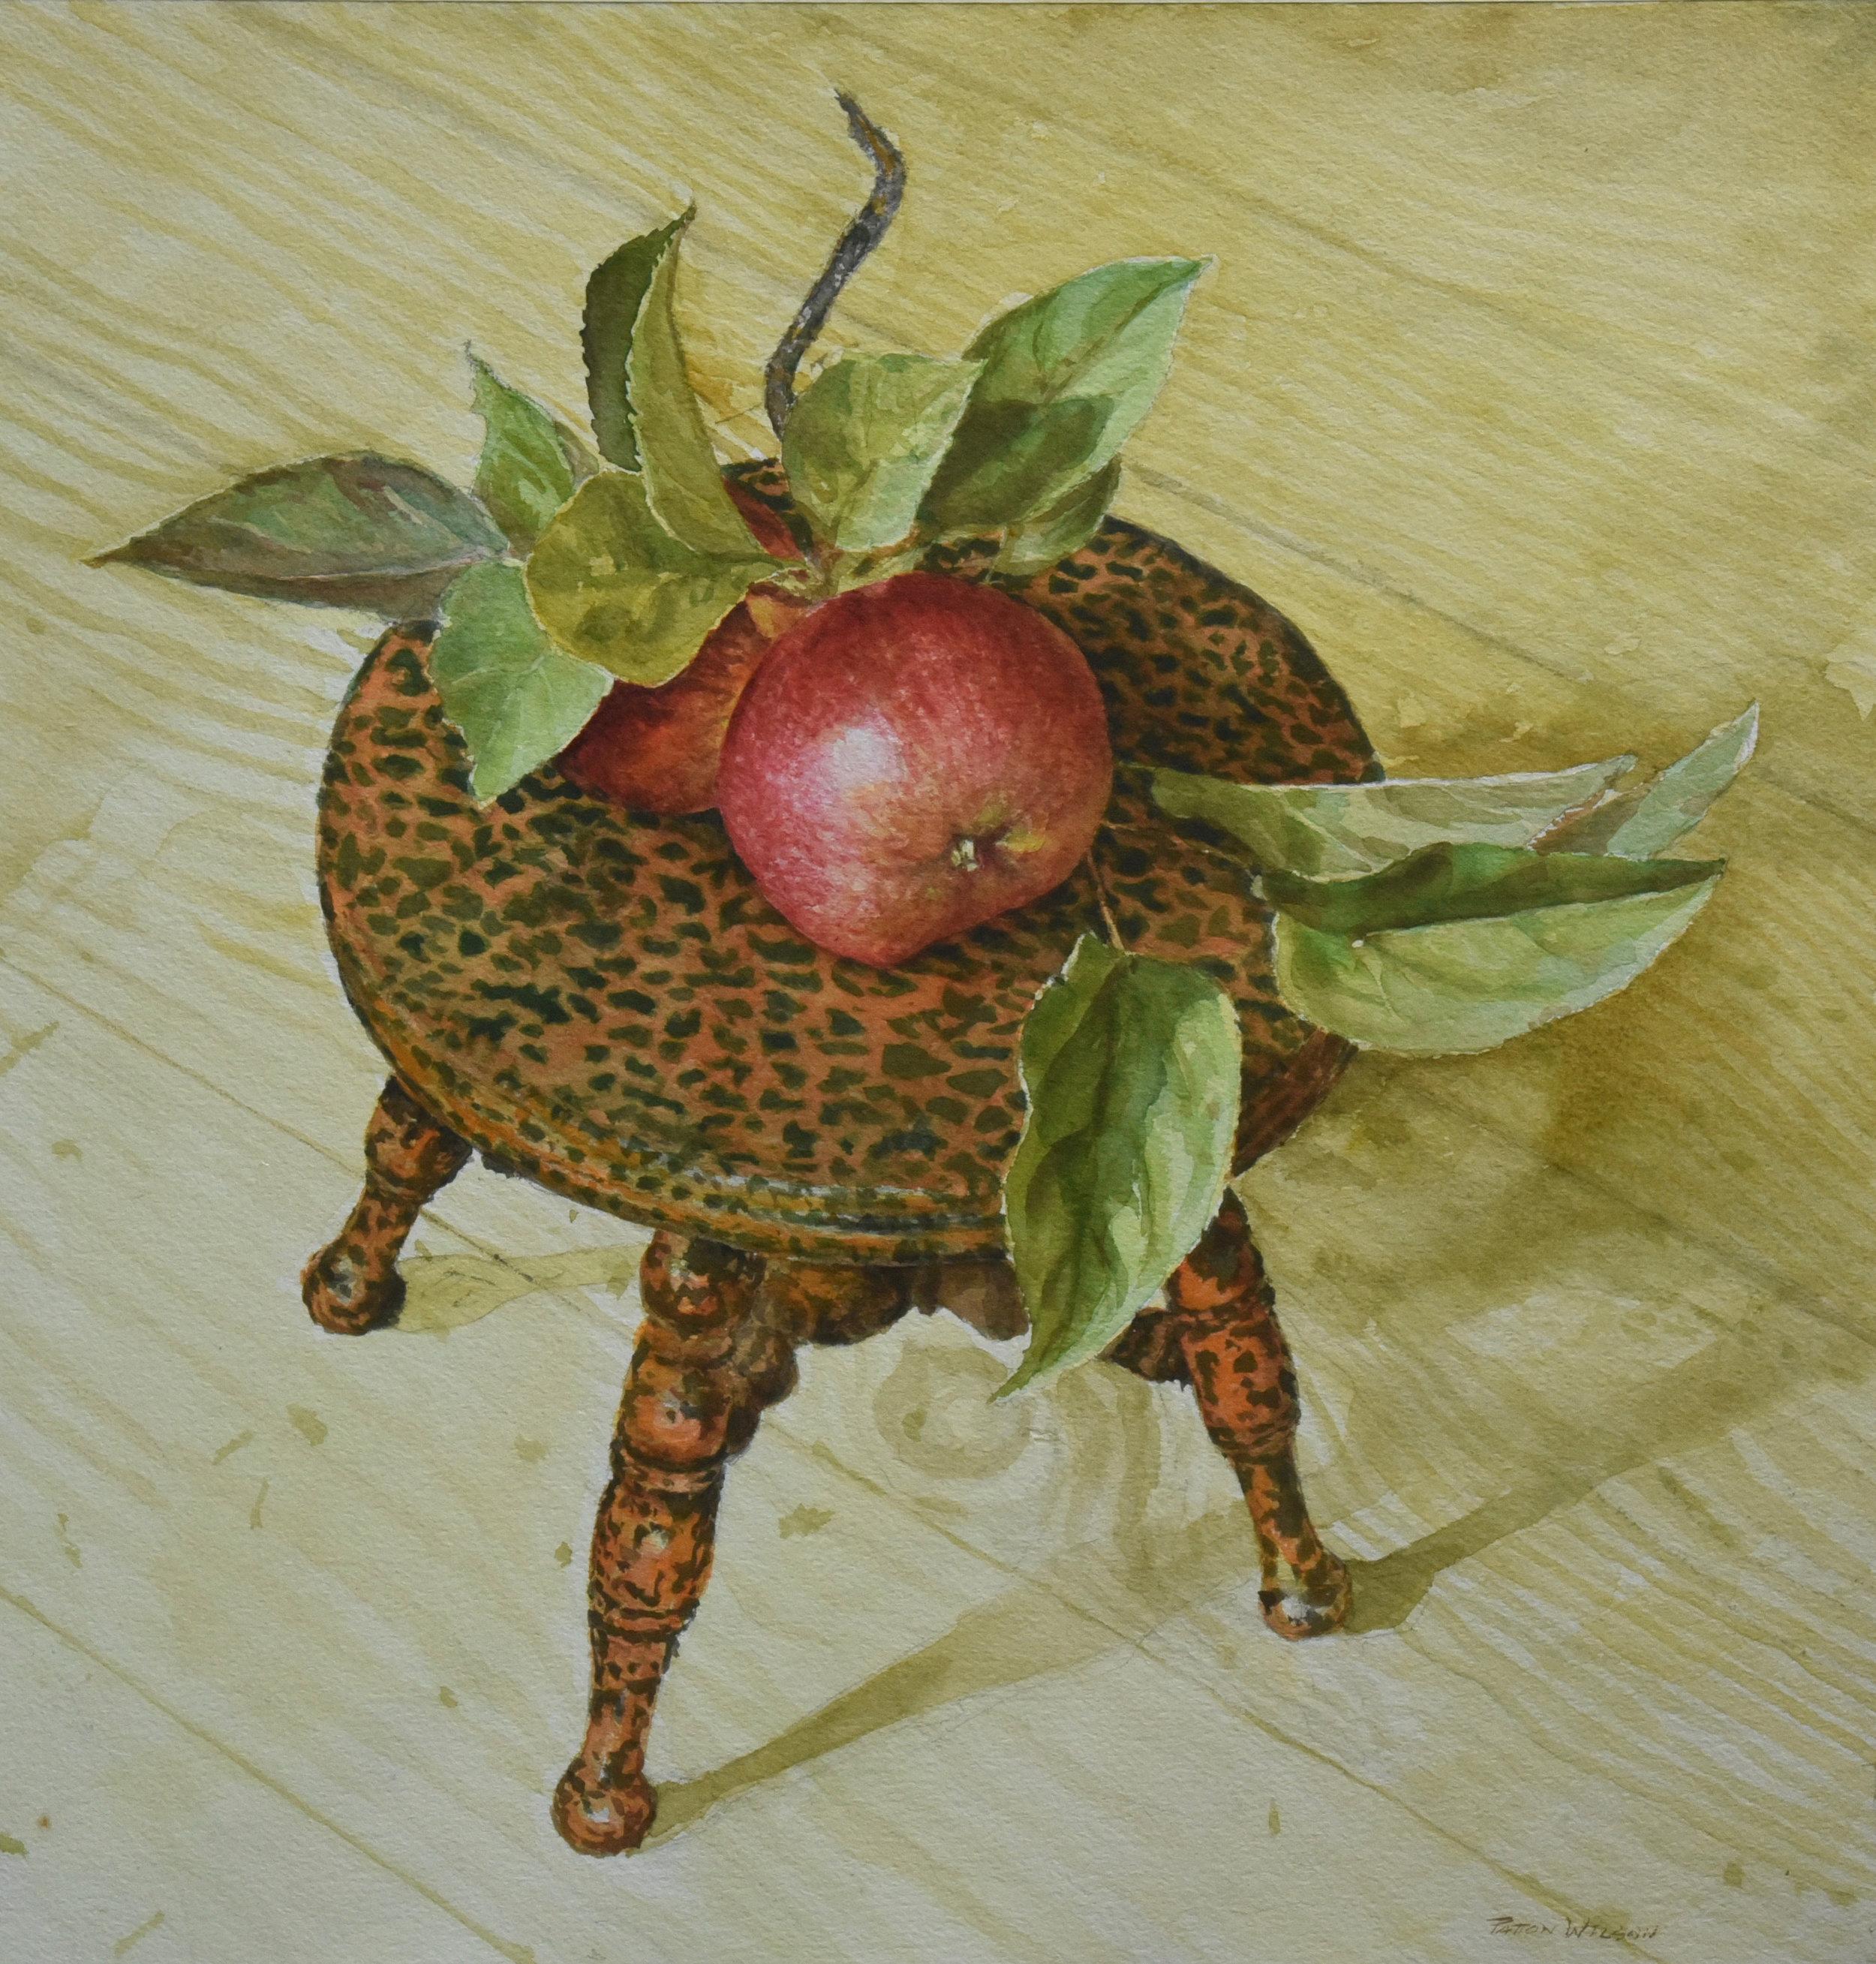 """LEOPARD APPLES"" Watercolor 18 x 17.5"